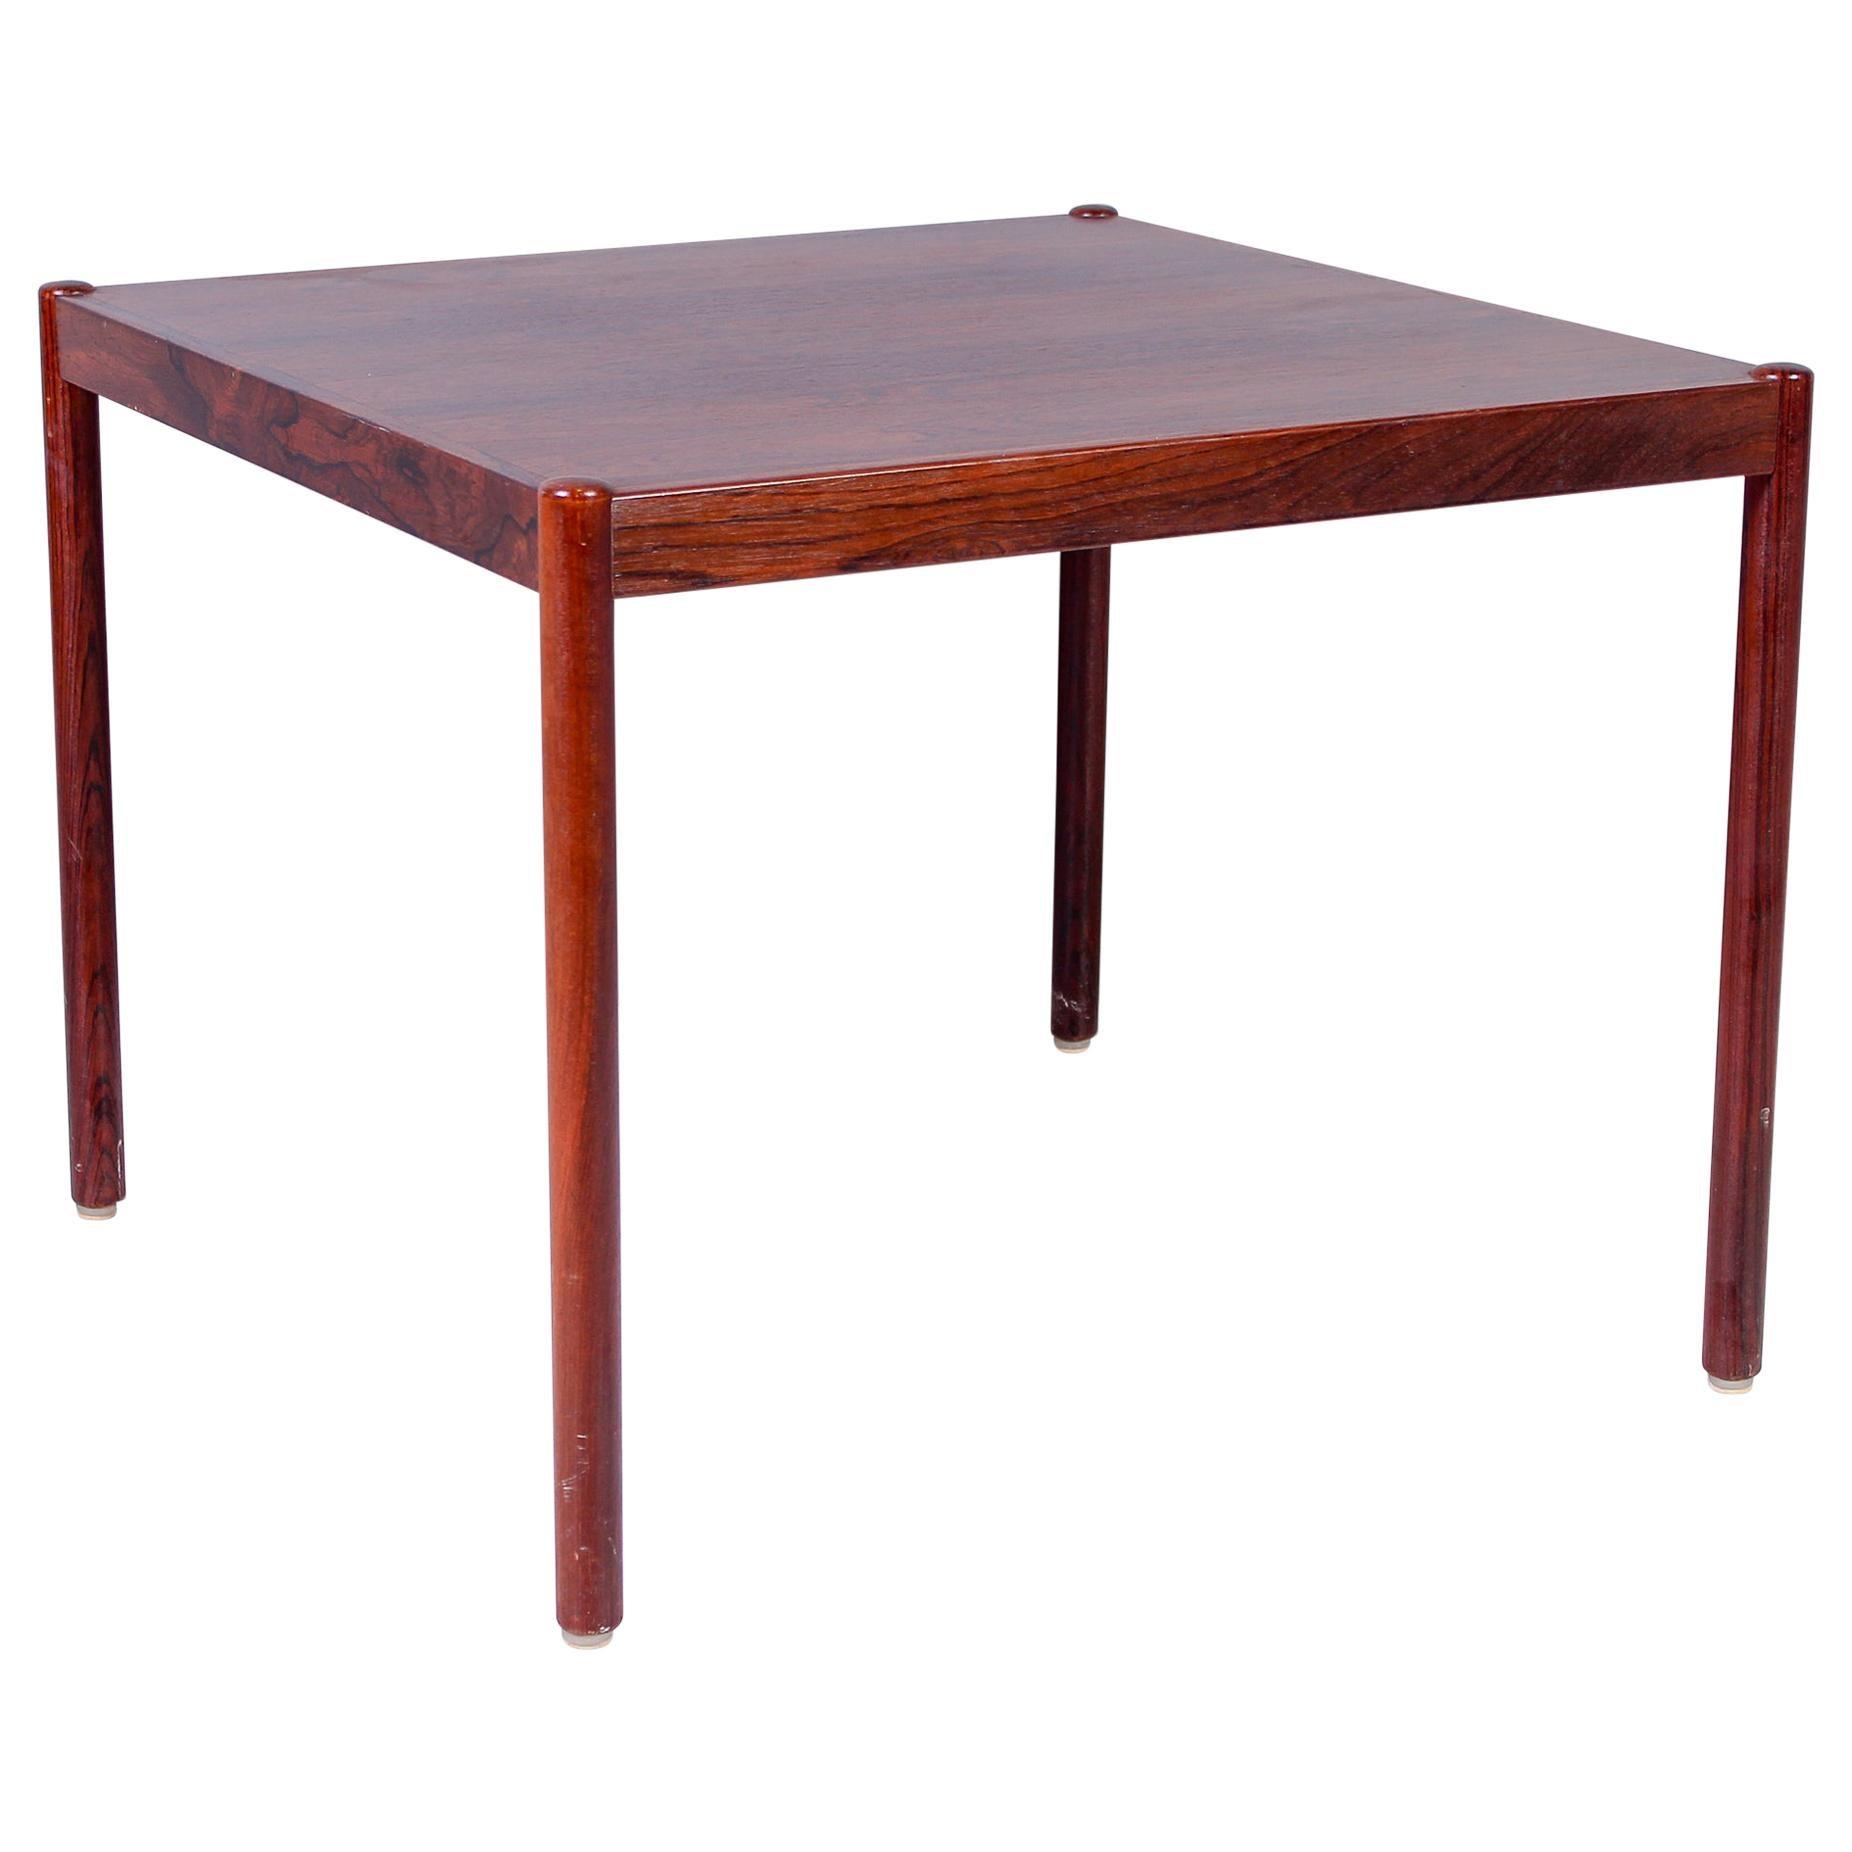 Rectangular Scandinavian Rosewood Coffee Table, 1950s